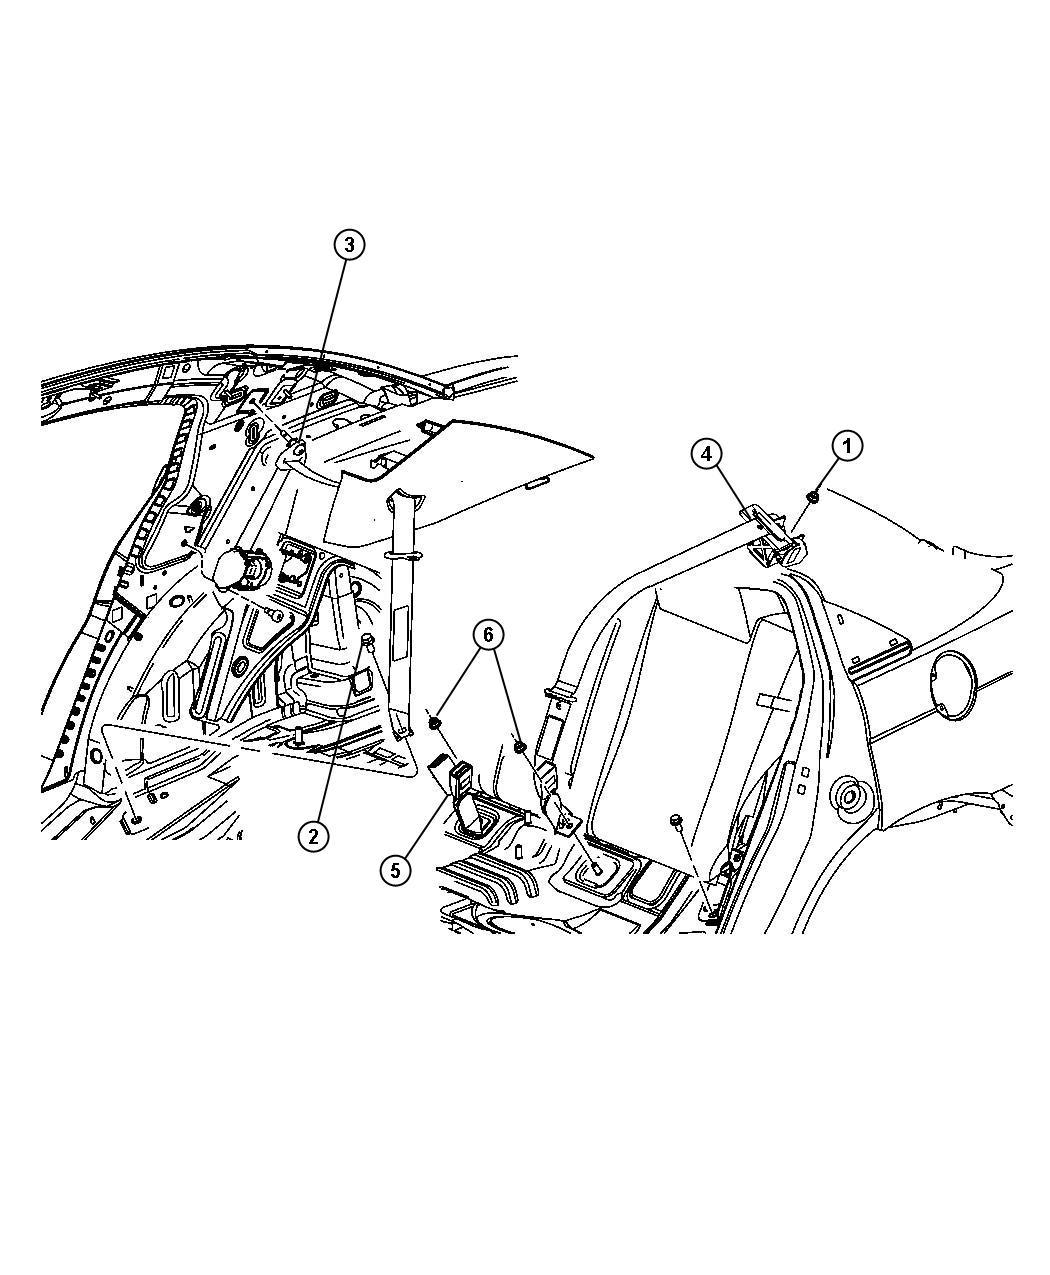 Chrysler Sebring Seat Belt Retractor Right Dv E Marked Seat Belts Trim All Trim